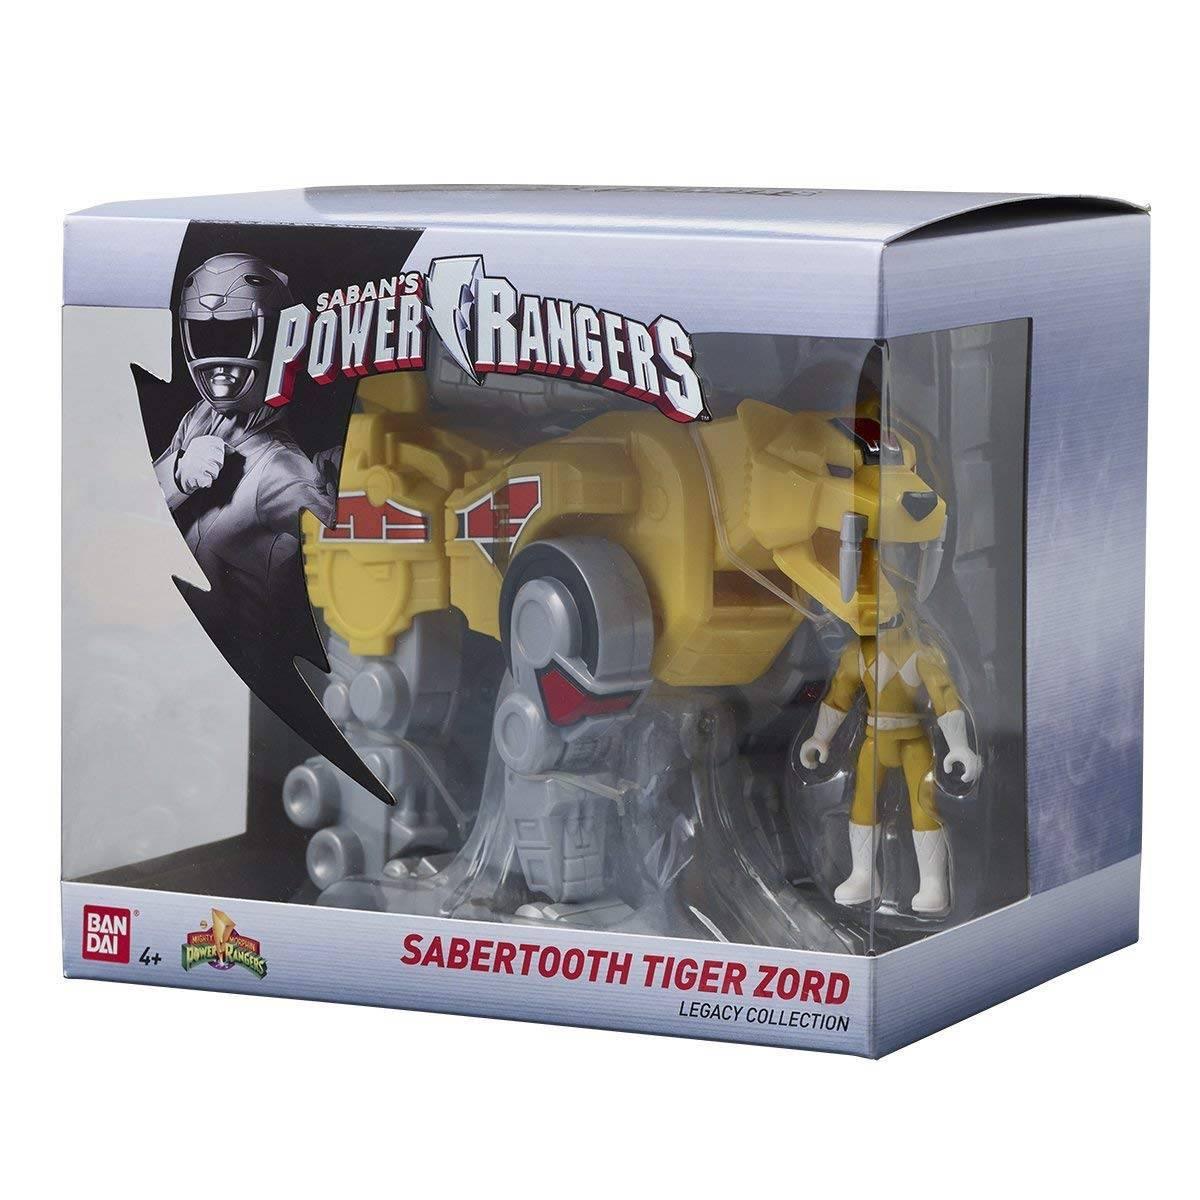 Power Rangers - Figurine Sabertooth Tiger Zord